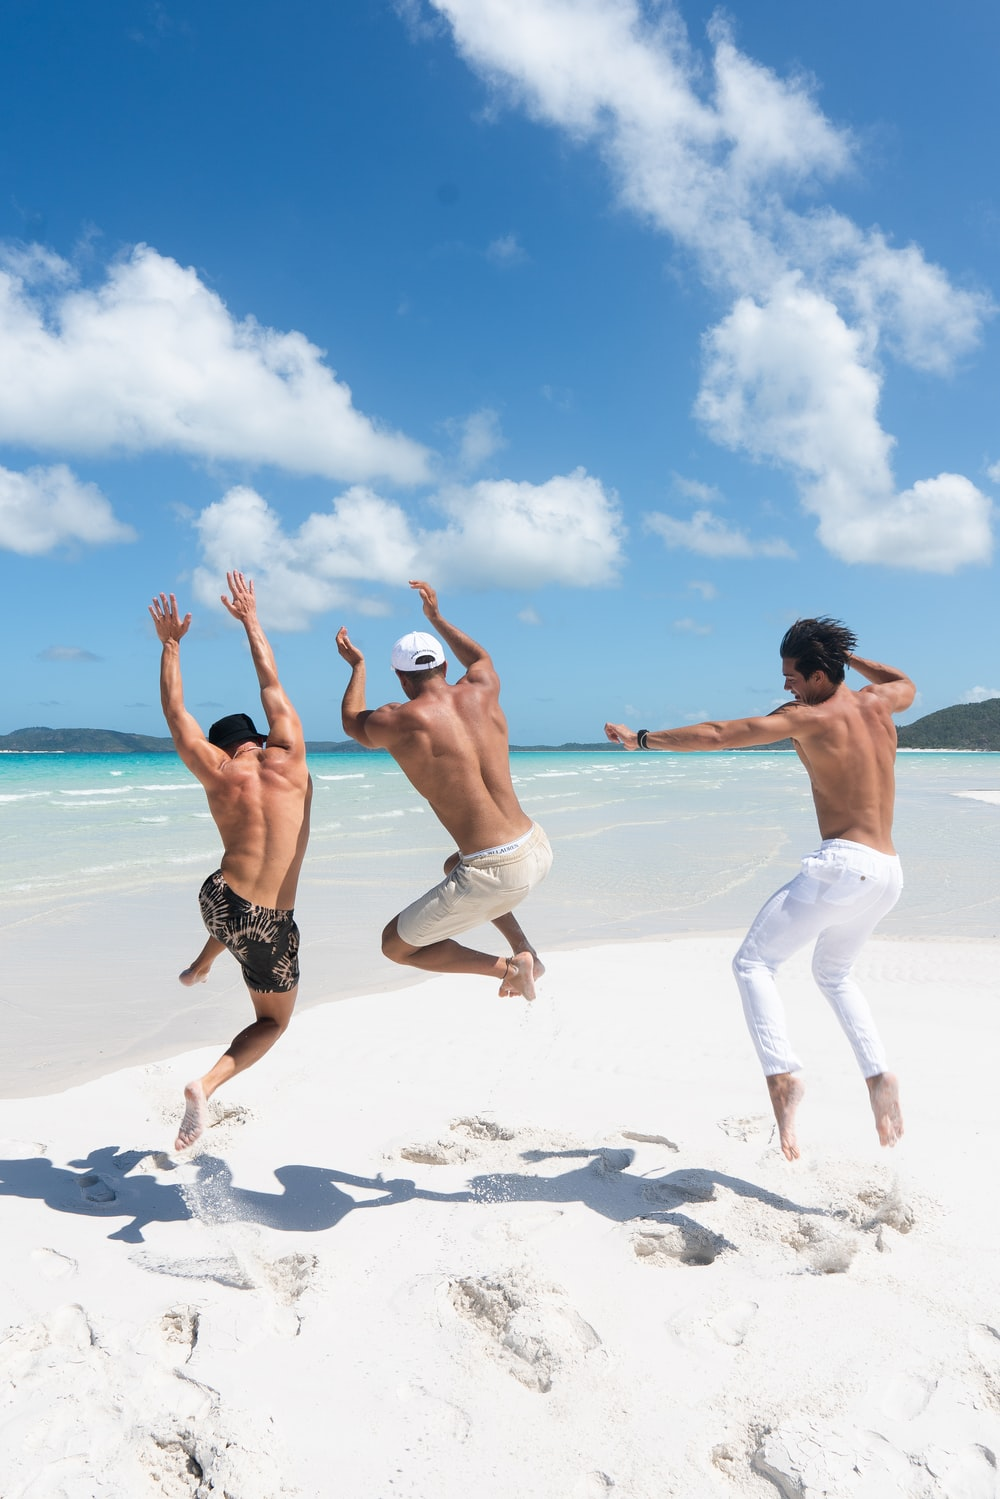 2 women in white shorts running on white sand beach during daytime